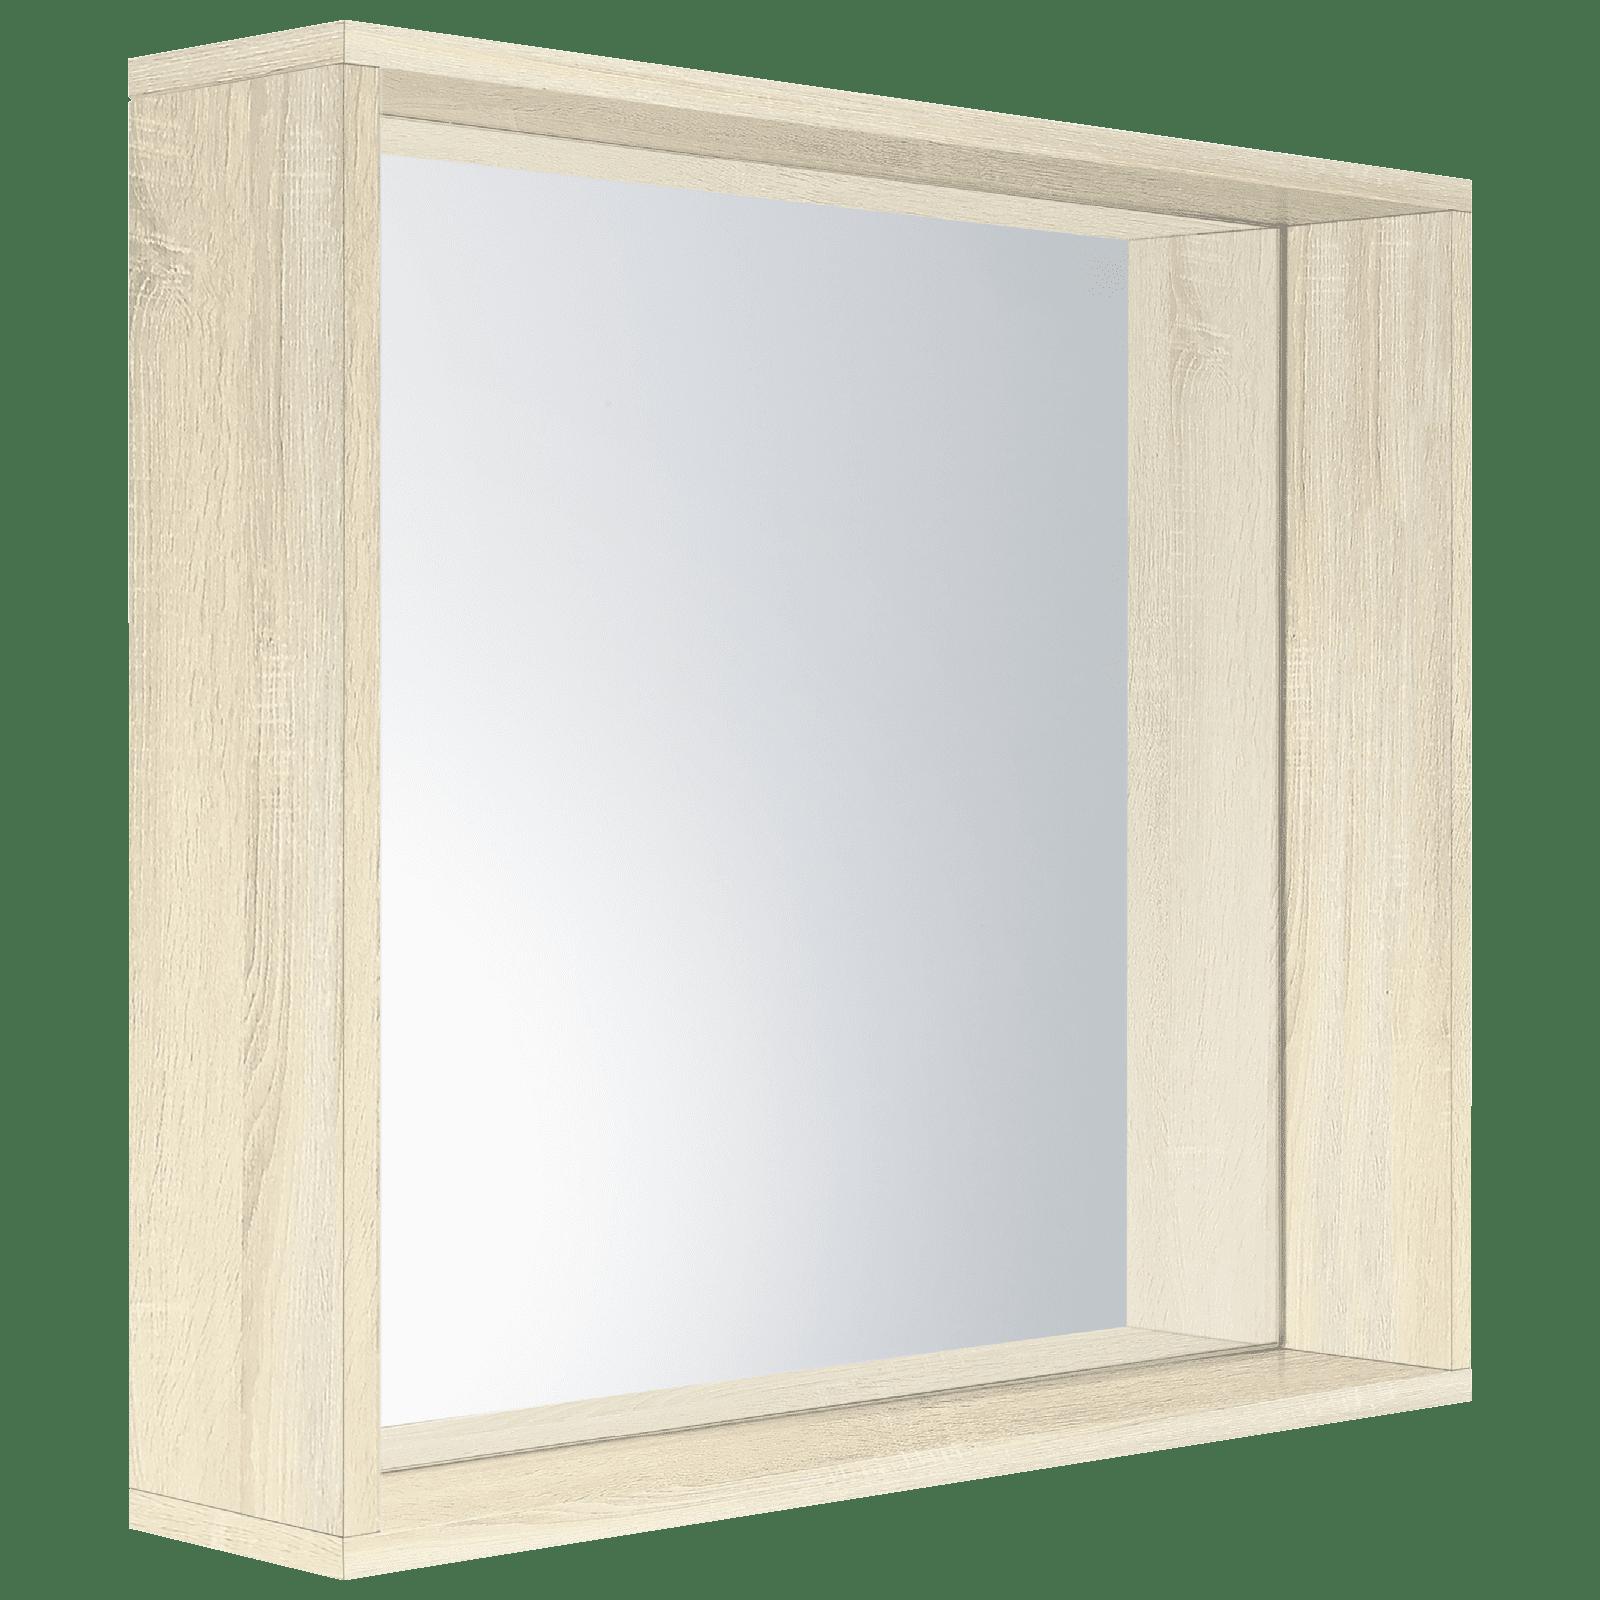 Cibo Design 600 x 600mm Coast Veneer Fresh Frame Mirror